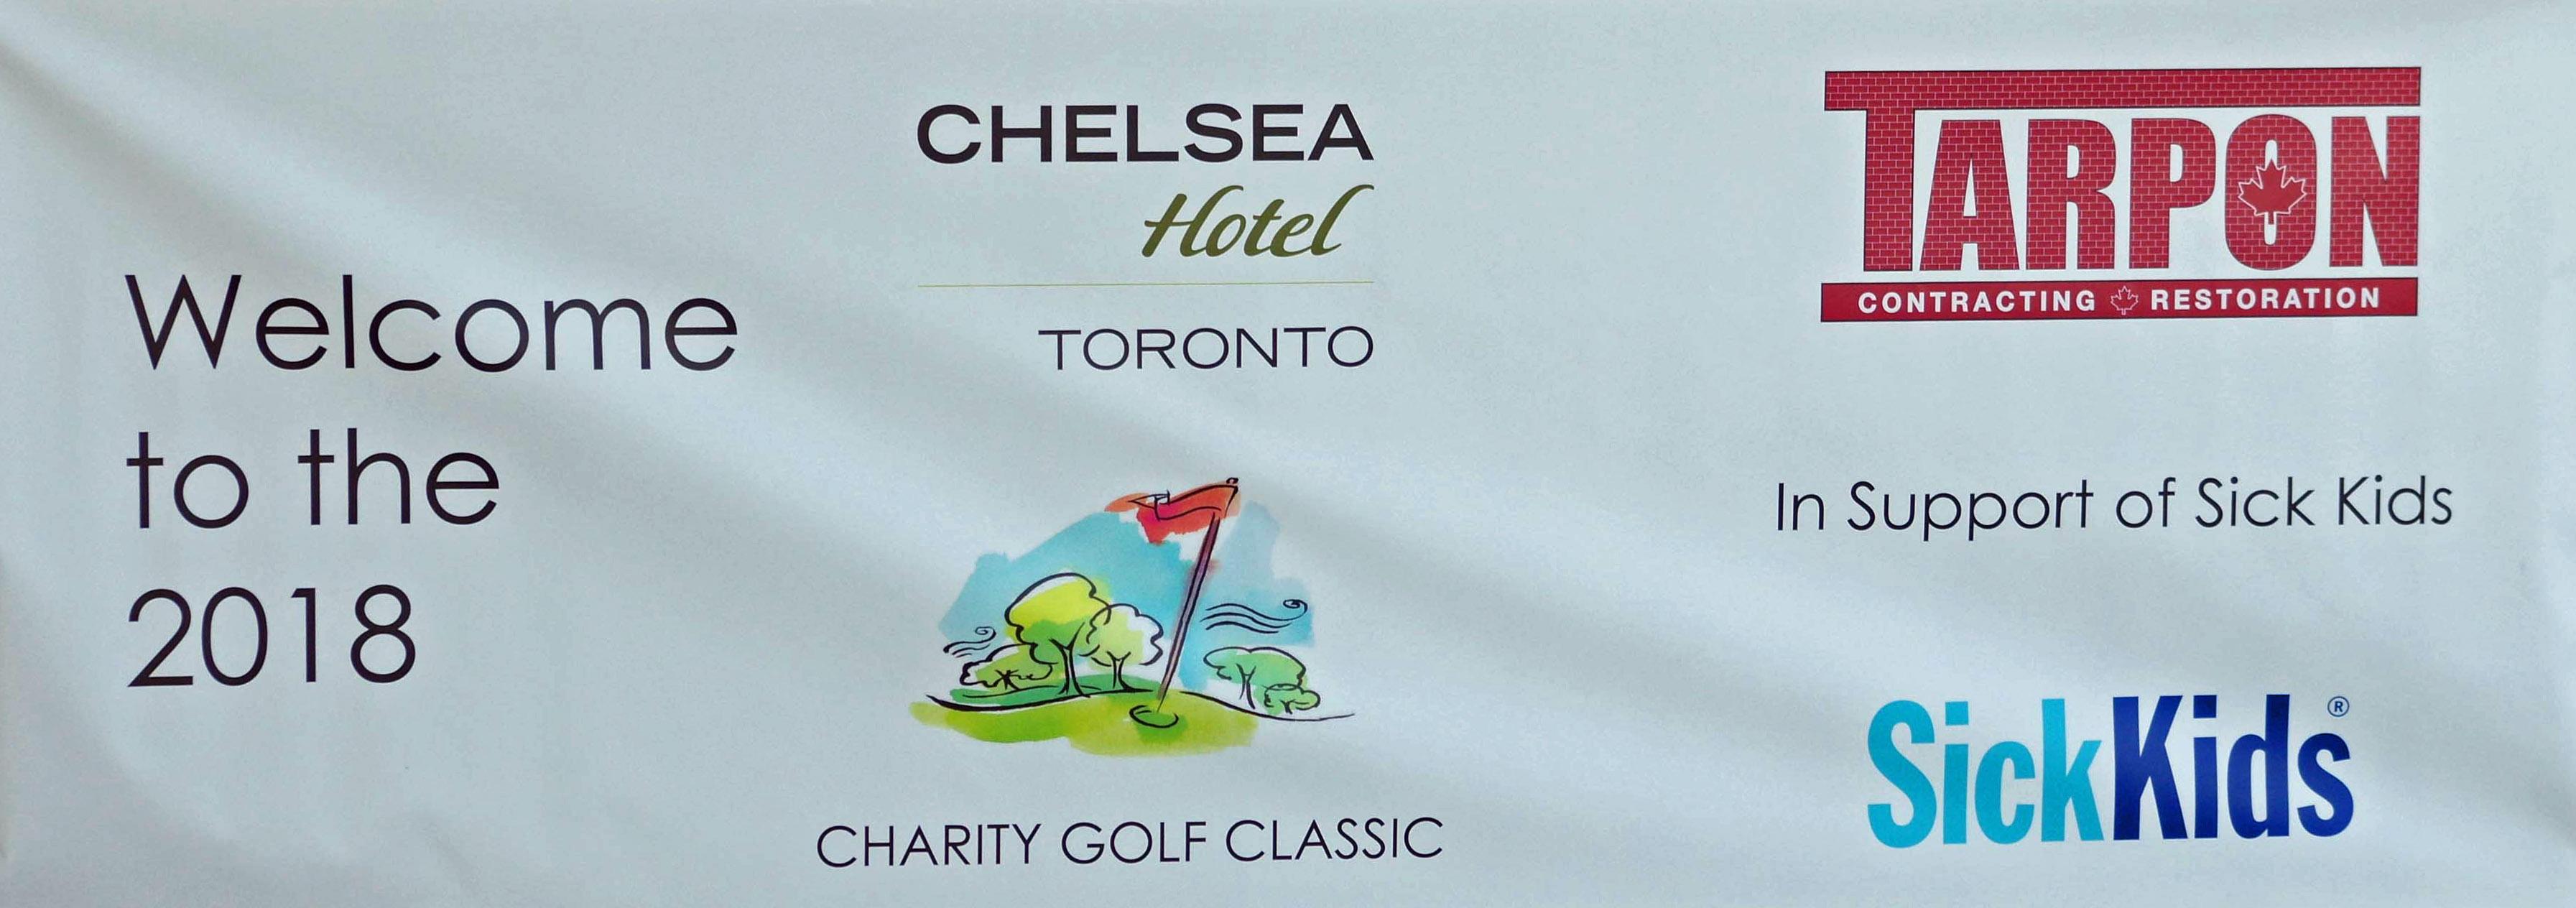 Chelsea Charity Golf Classic